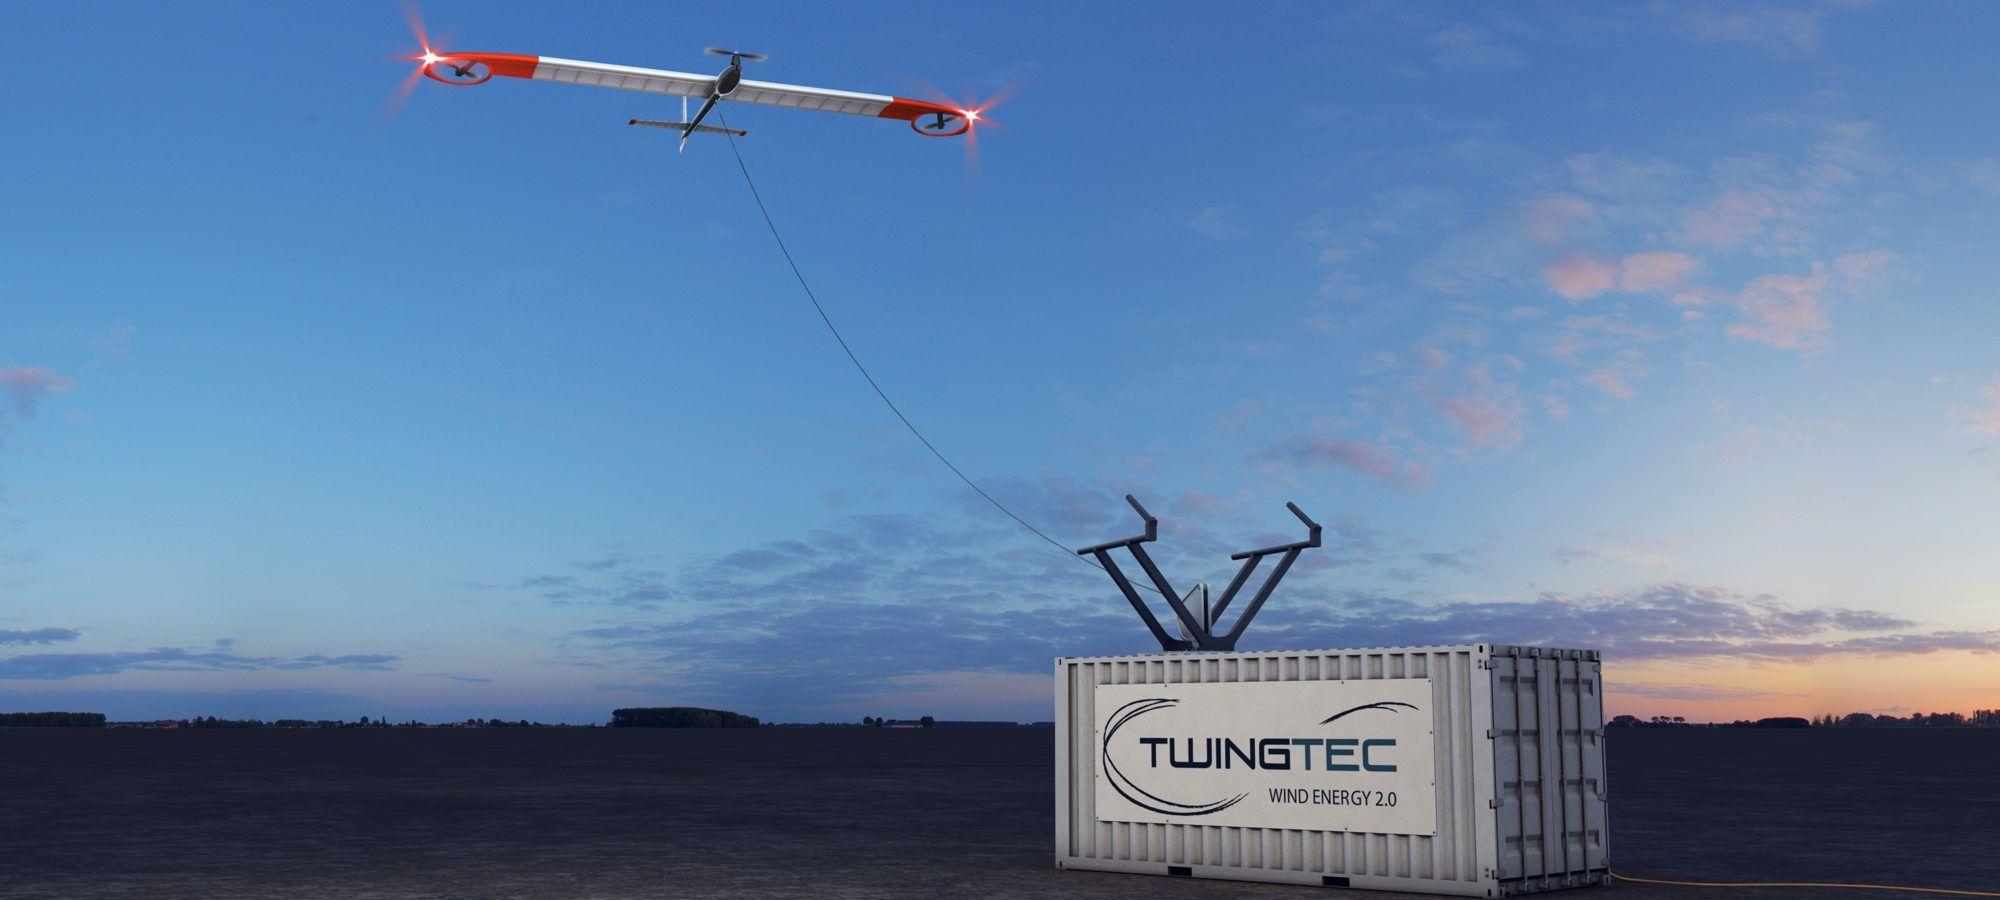 TWINGTEC开发了利用风能飞行的飞行器,其起降阶段类似多旋翼飞行器(图片来自于官网)